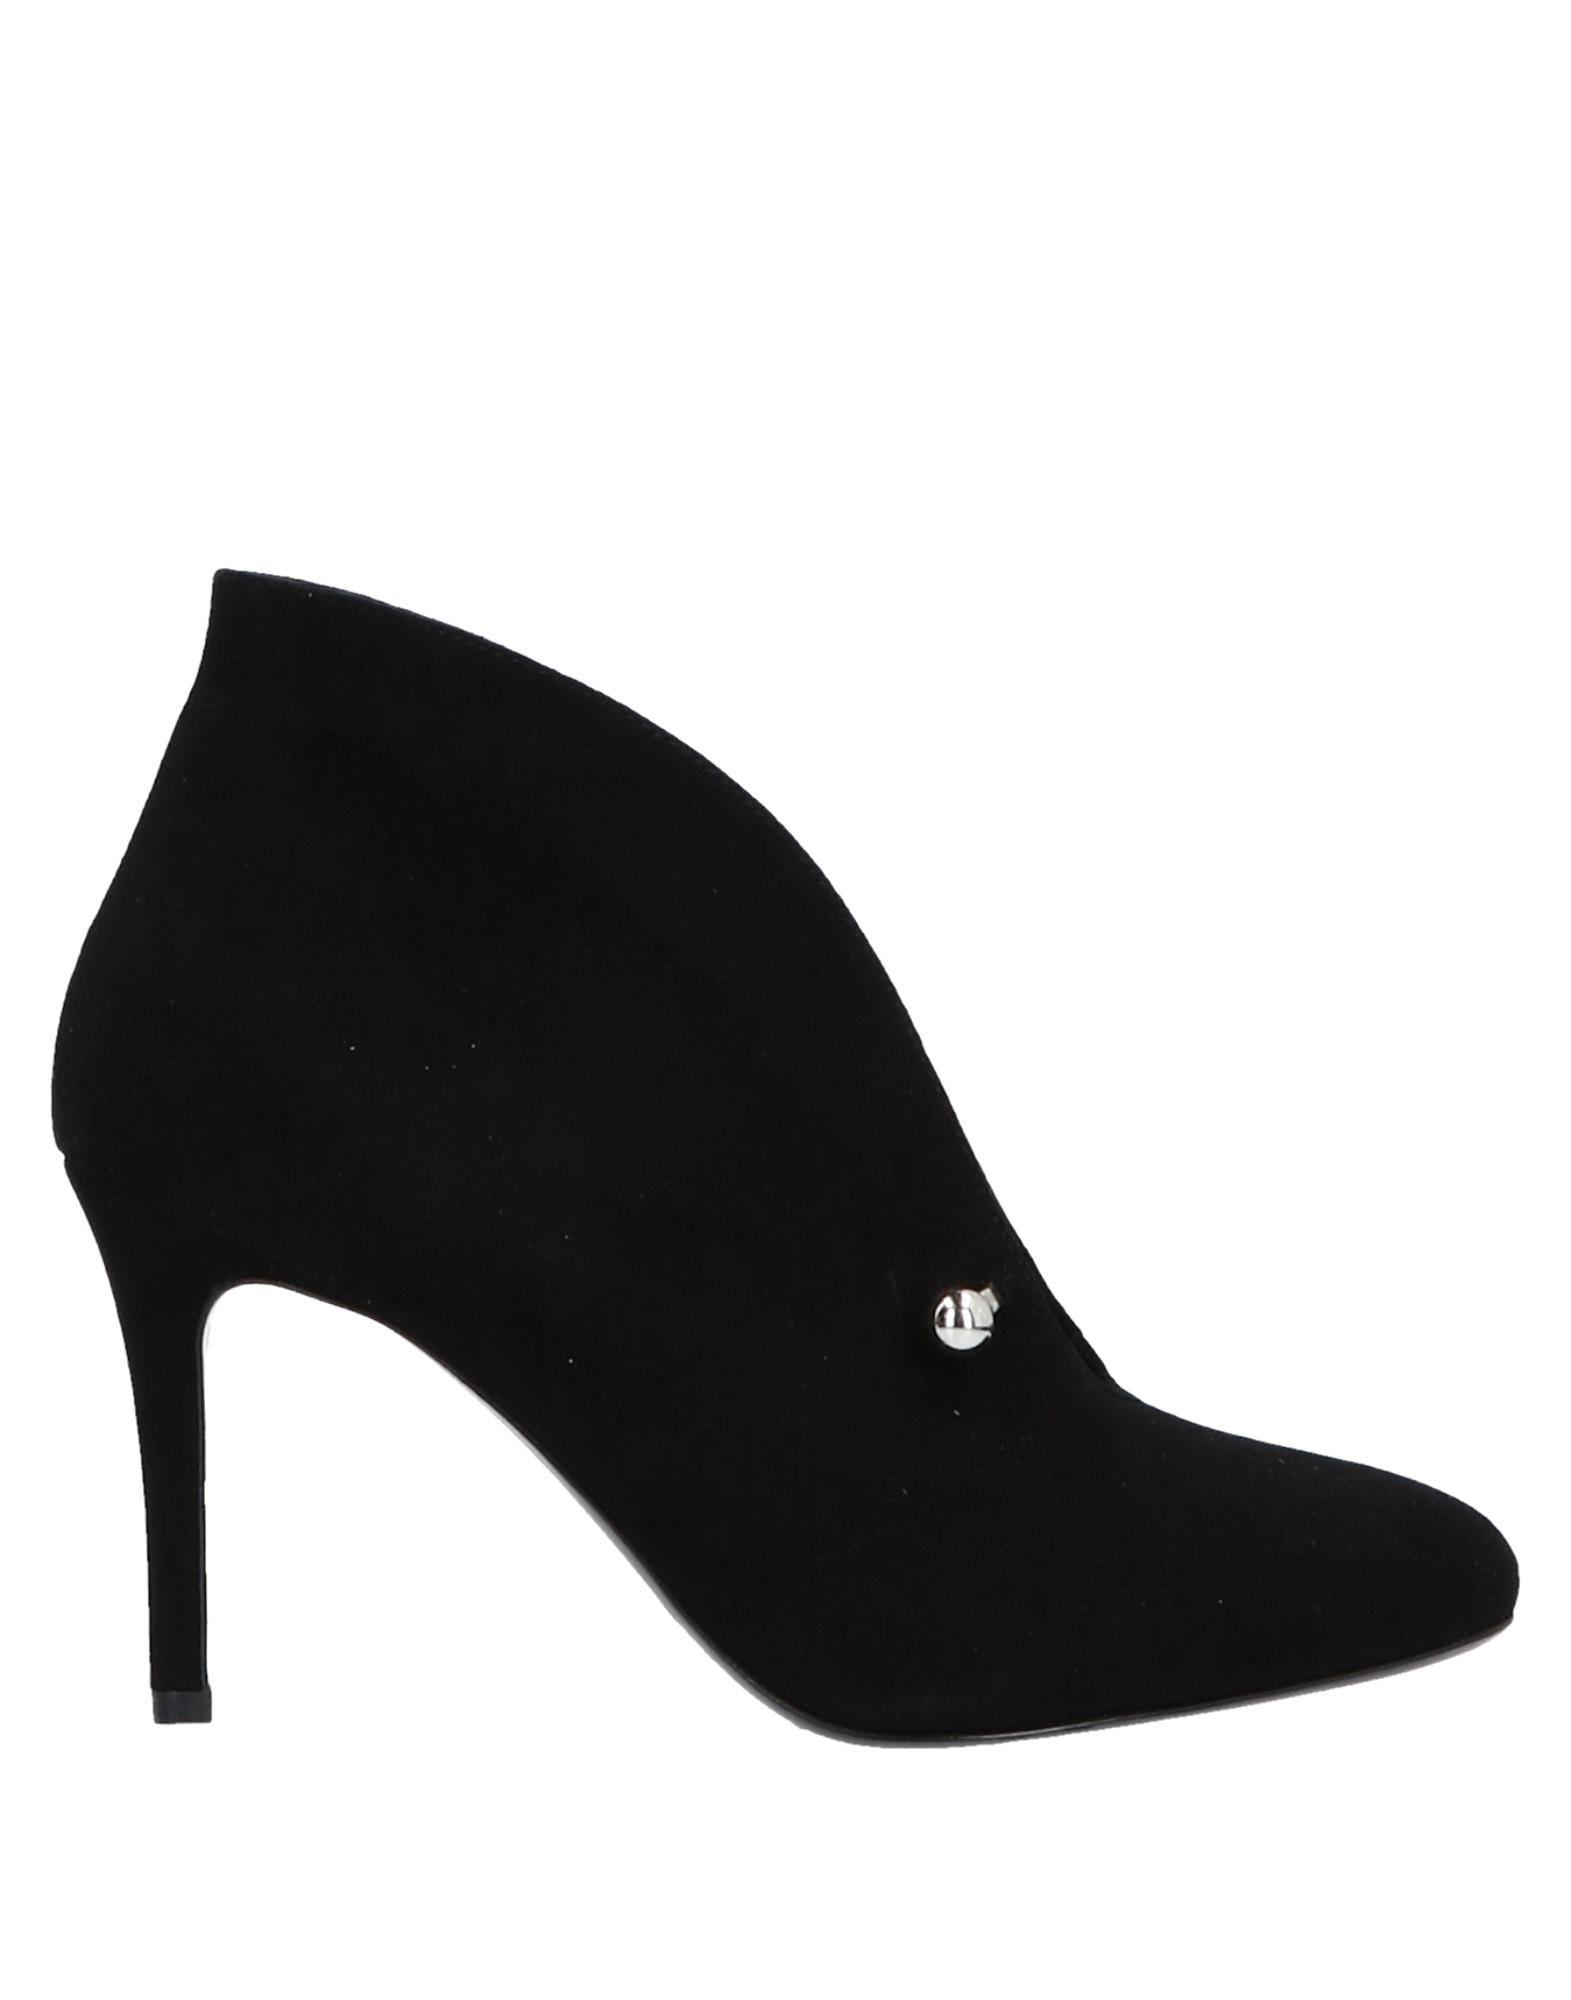 Stilvolle billige Schuhe Damen Carla G. Stiefelette Damen Schuhe  11522959VN af3a25